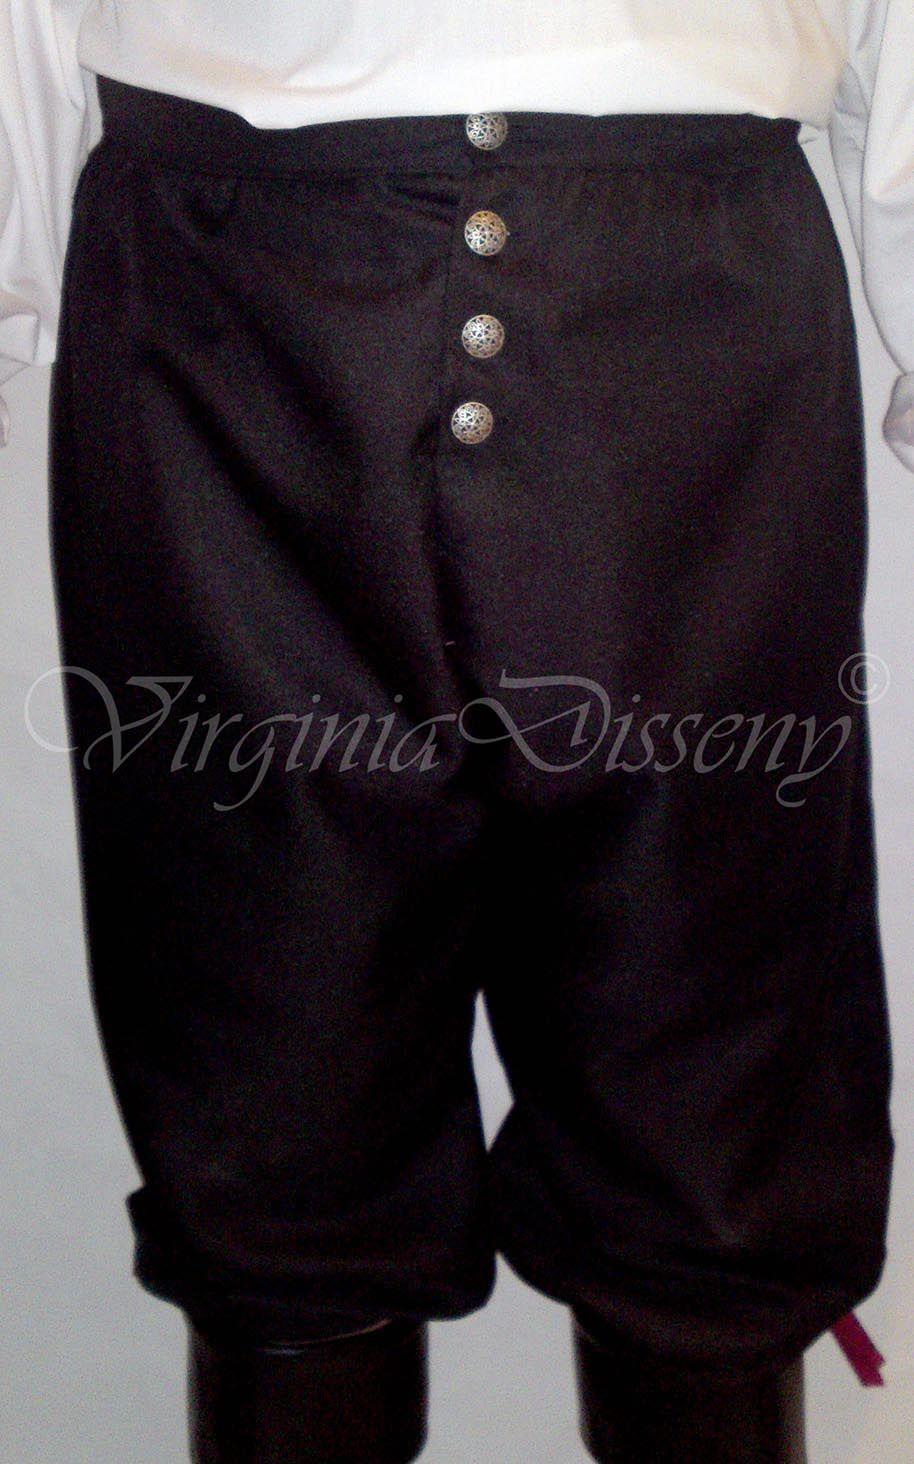 nike huarache sans lumi re gris noir - Pantal��n siglo XVII - Pants 17th century | 17th century clothes ...